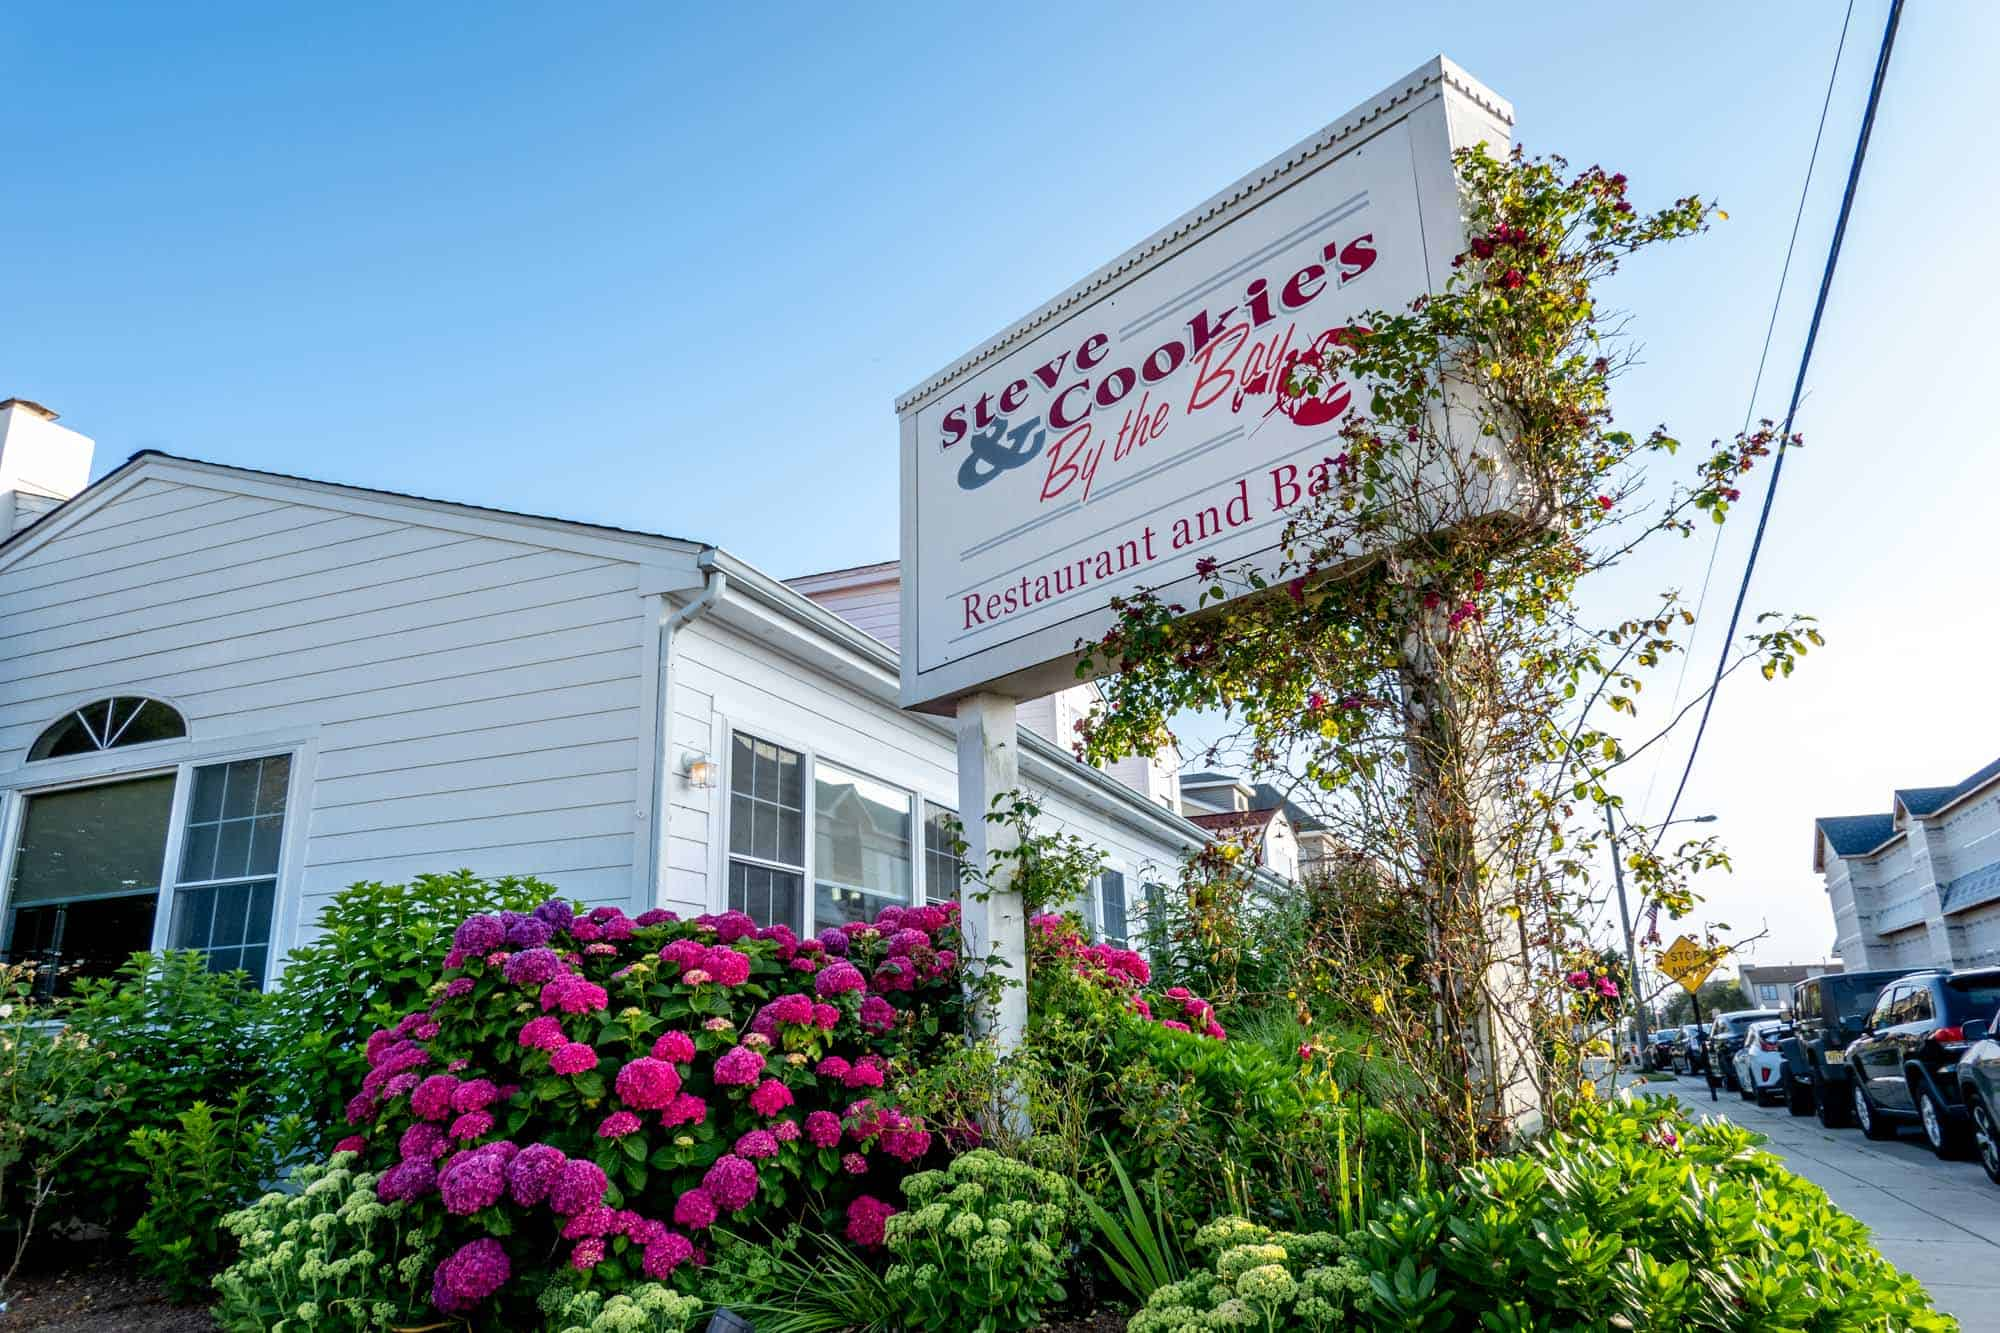 Exterior of Steve & Cookies restaurant with flowers